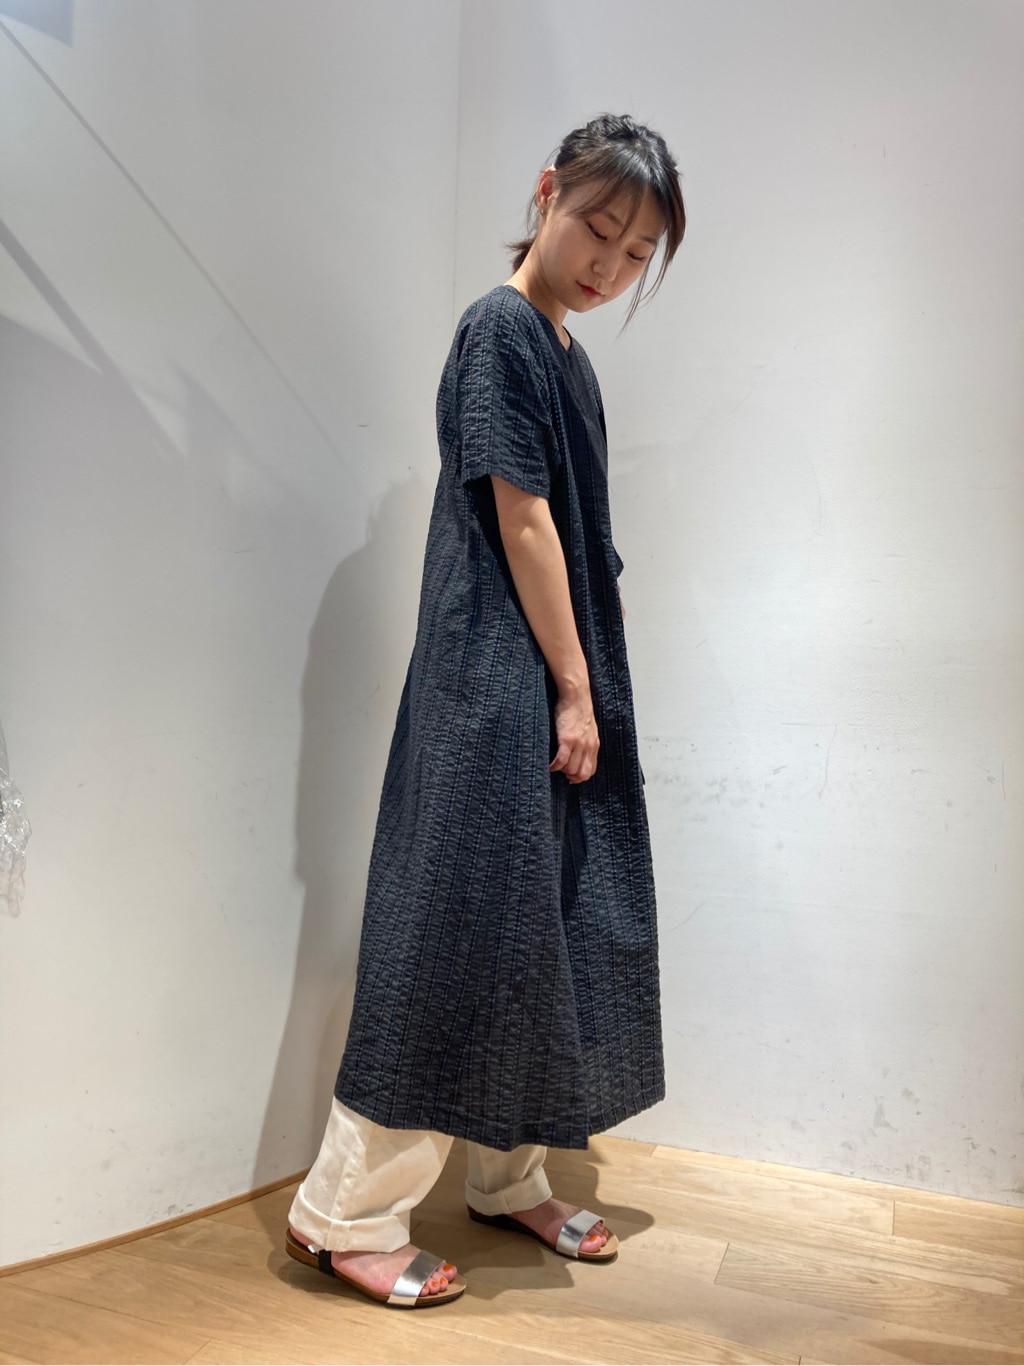 bulle de savon KITTE丸の内 身長:159cm 2020.07.17